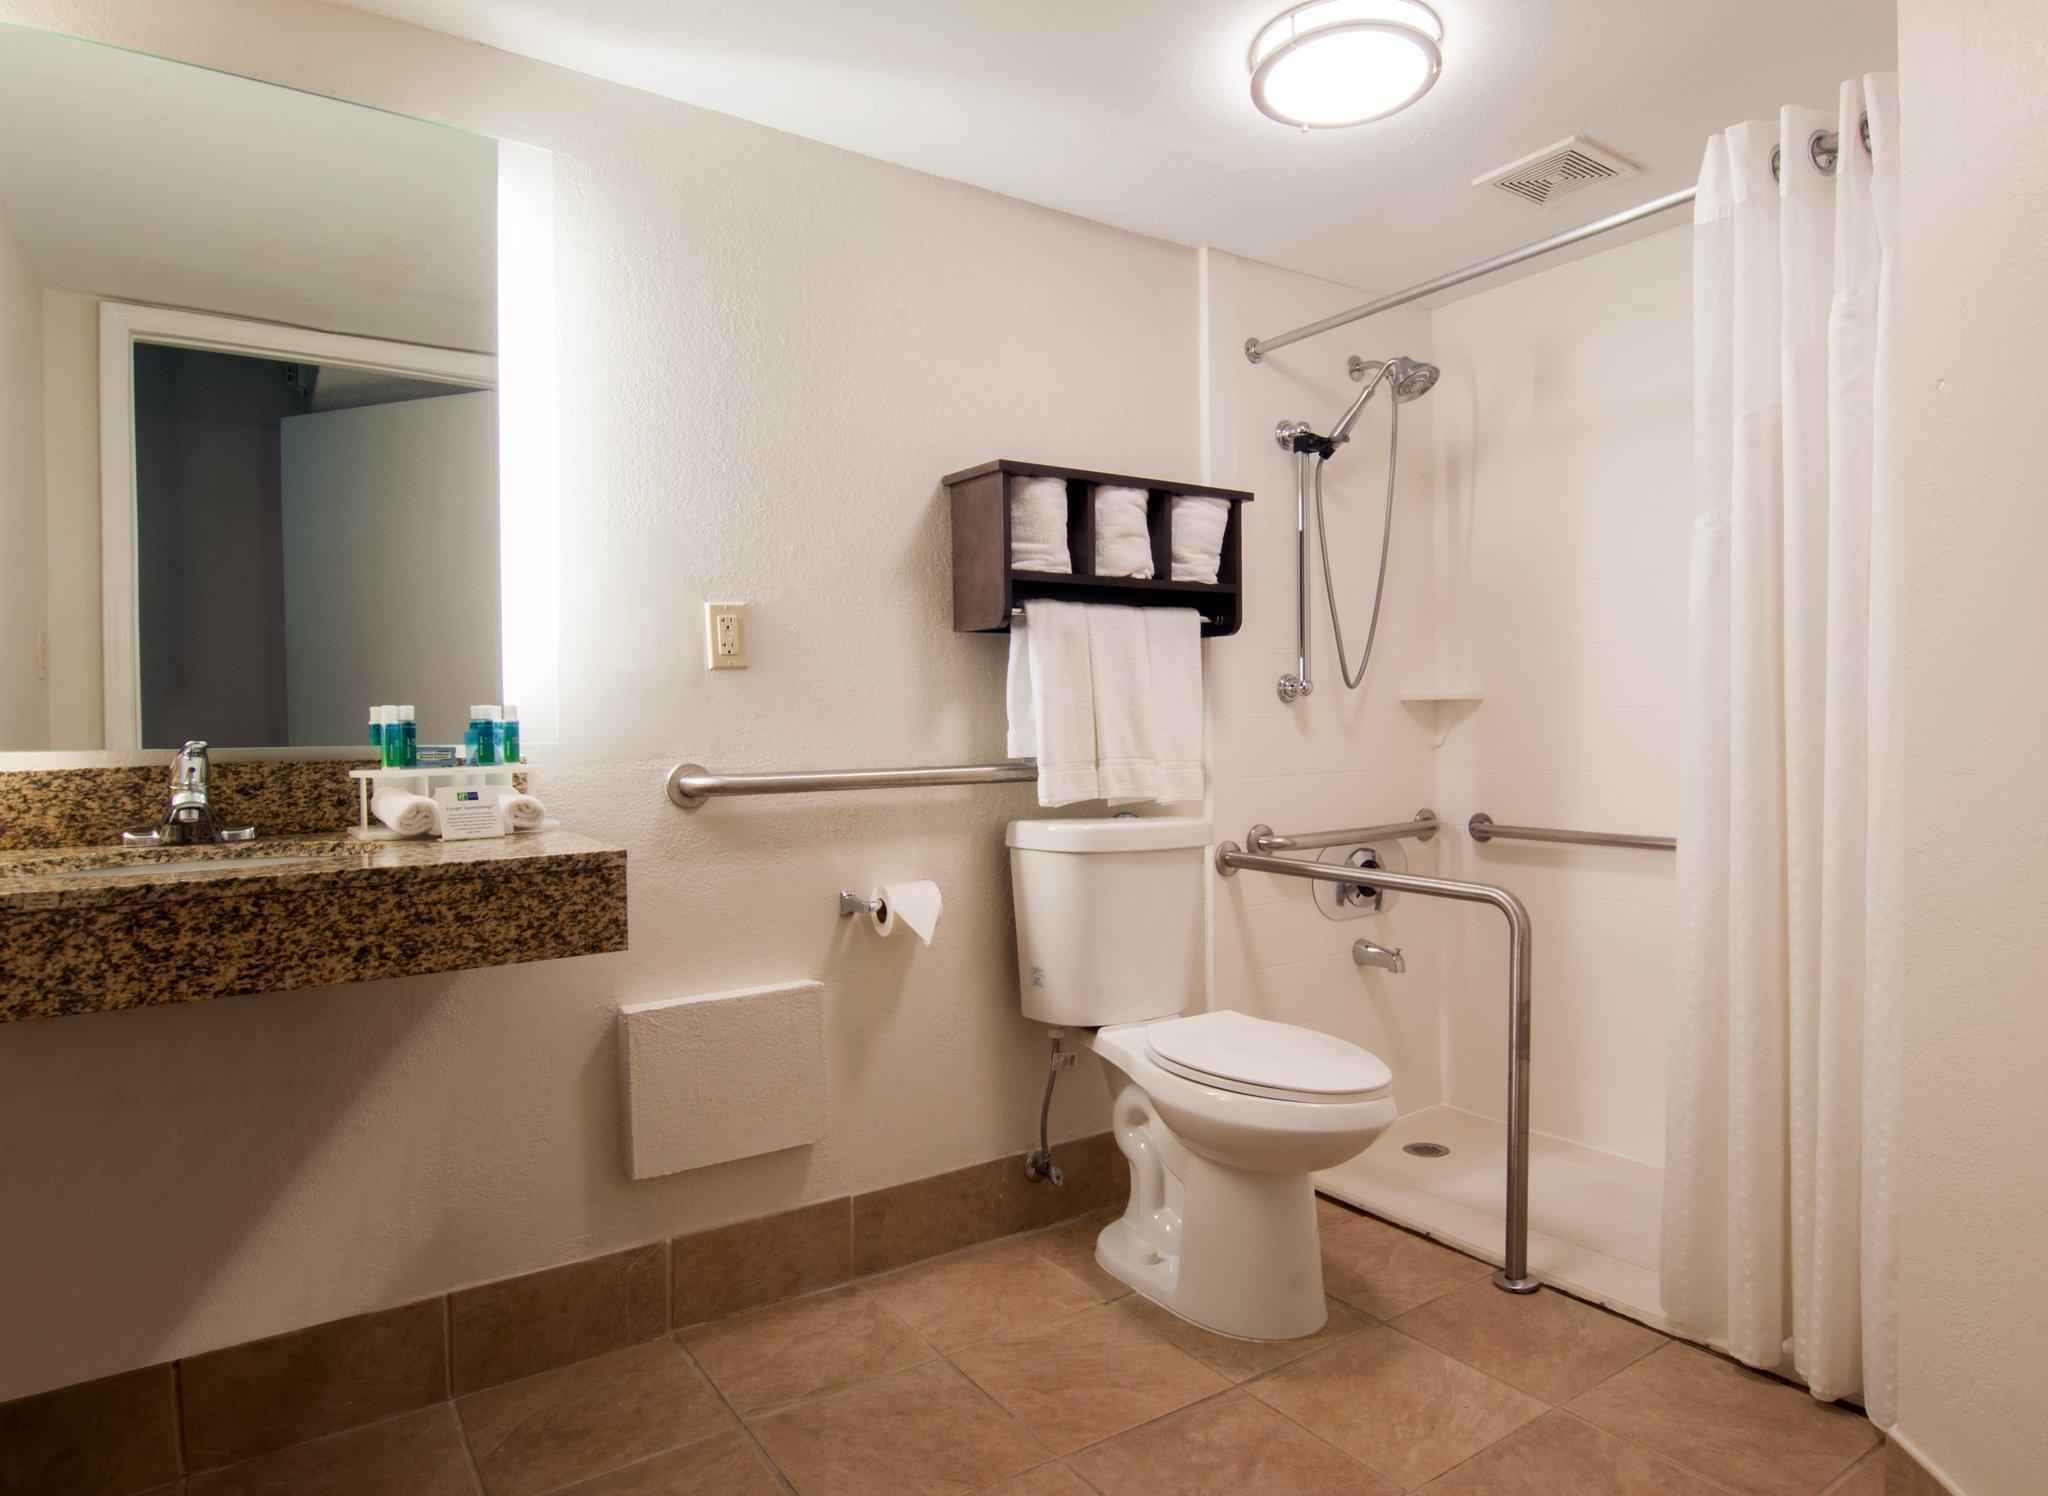 Holiday Inn Express & Suites Nashville I 40 & I 24 Spence Lane